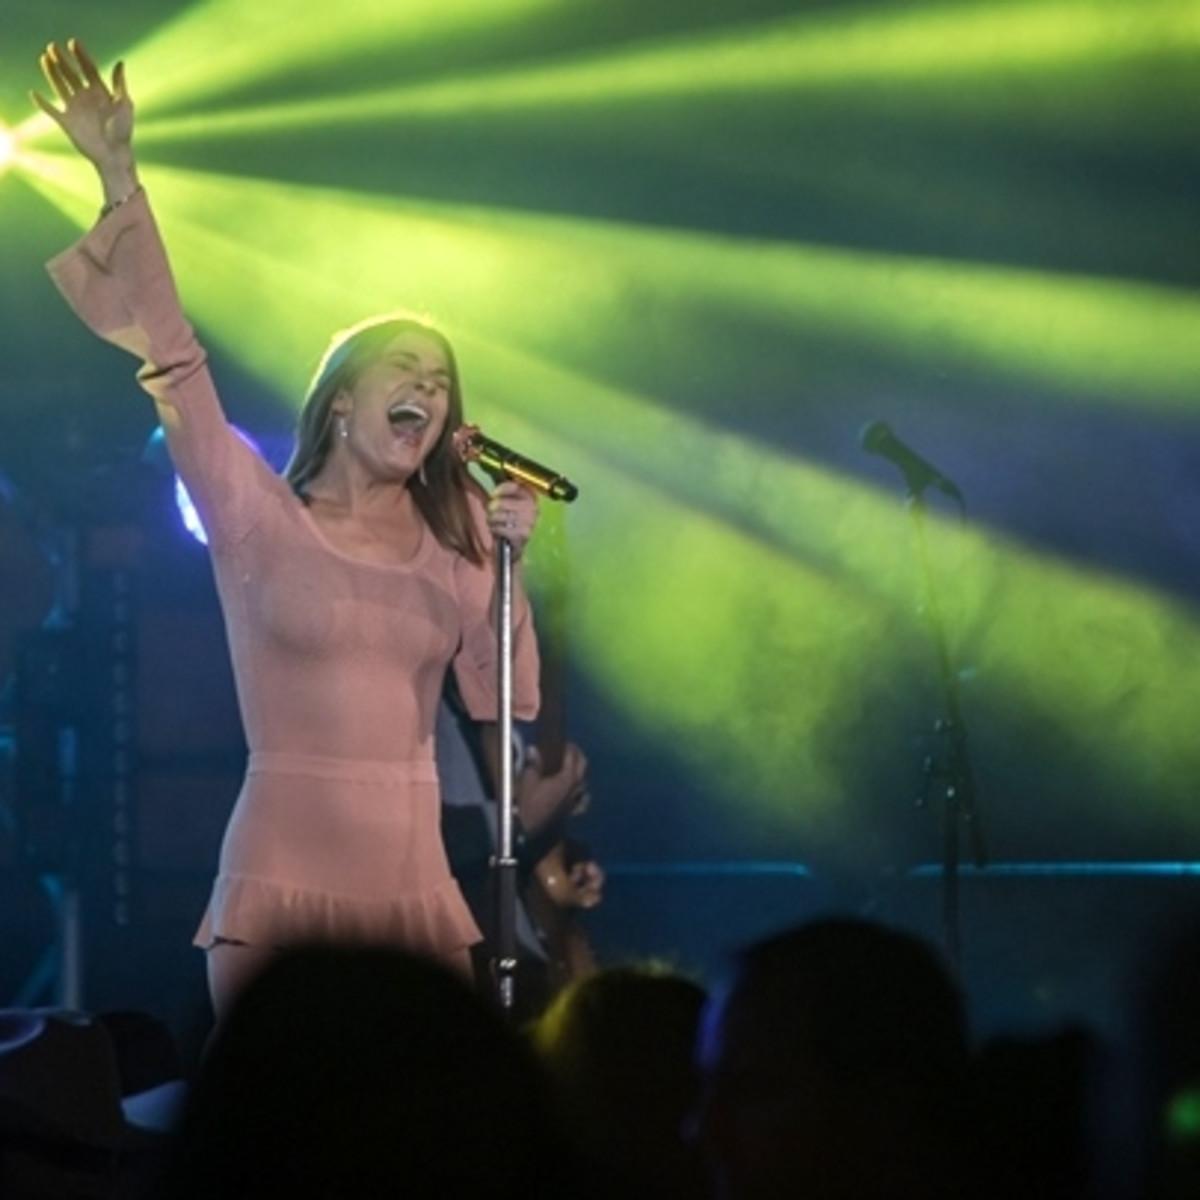 Fort Worth, JLH Grand Entry Gala, January 2018, LeAnn Rimes